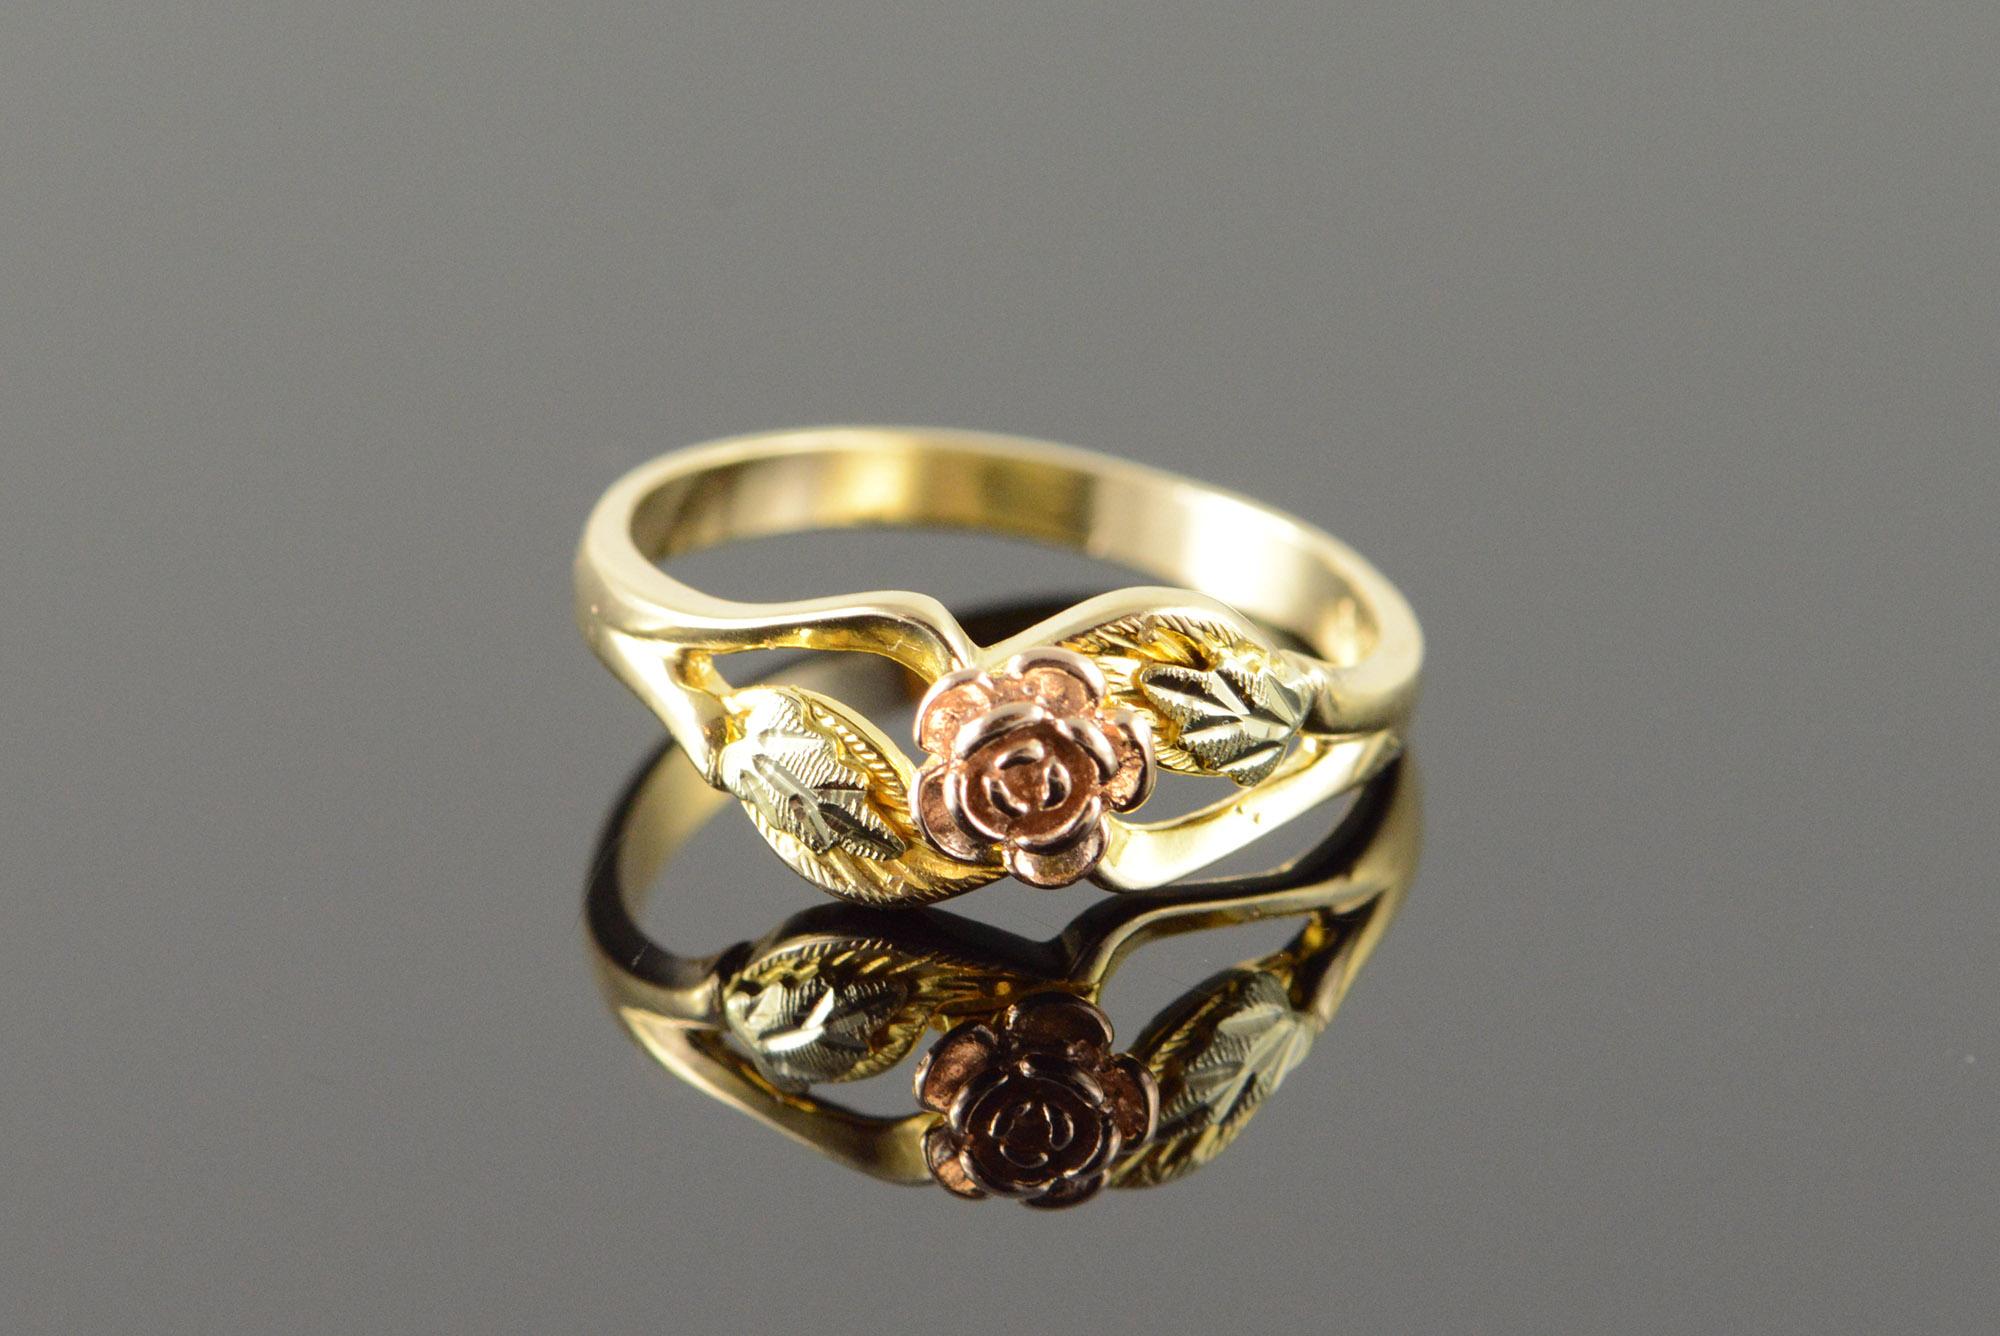 10k 25g black hills tri color rose flower yellow gold ring size 10k 25g black hills tri color rose flower yellow gold ring size 75 mightylinksfo